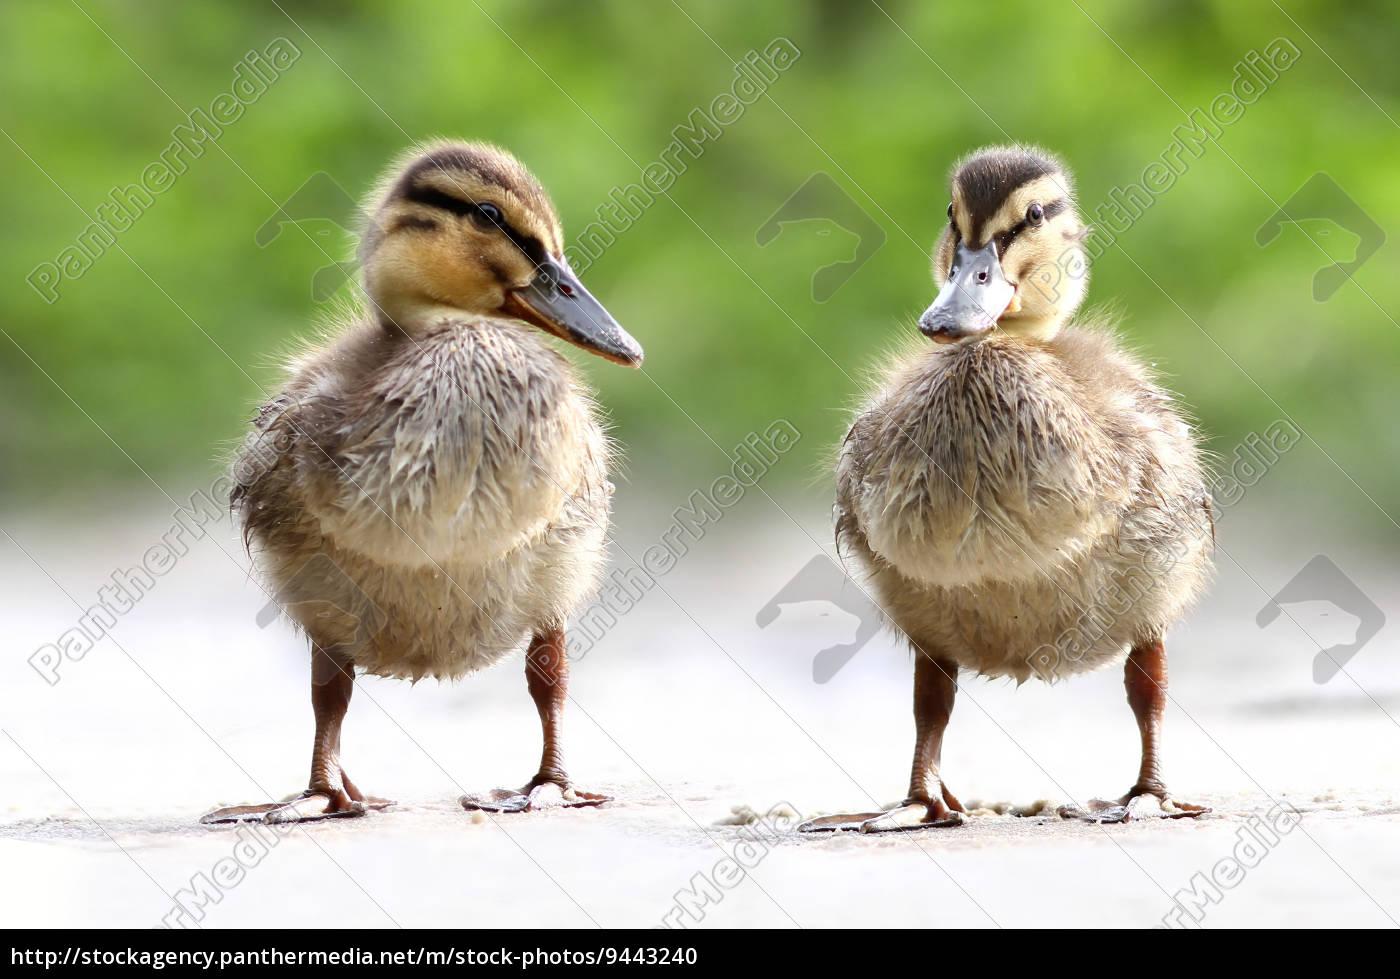 anas, platyrhynchos, -, l'anatra, (the, duck) - 9443240